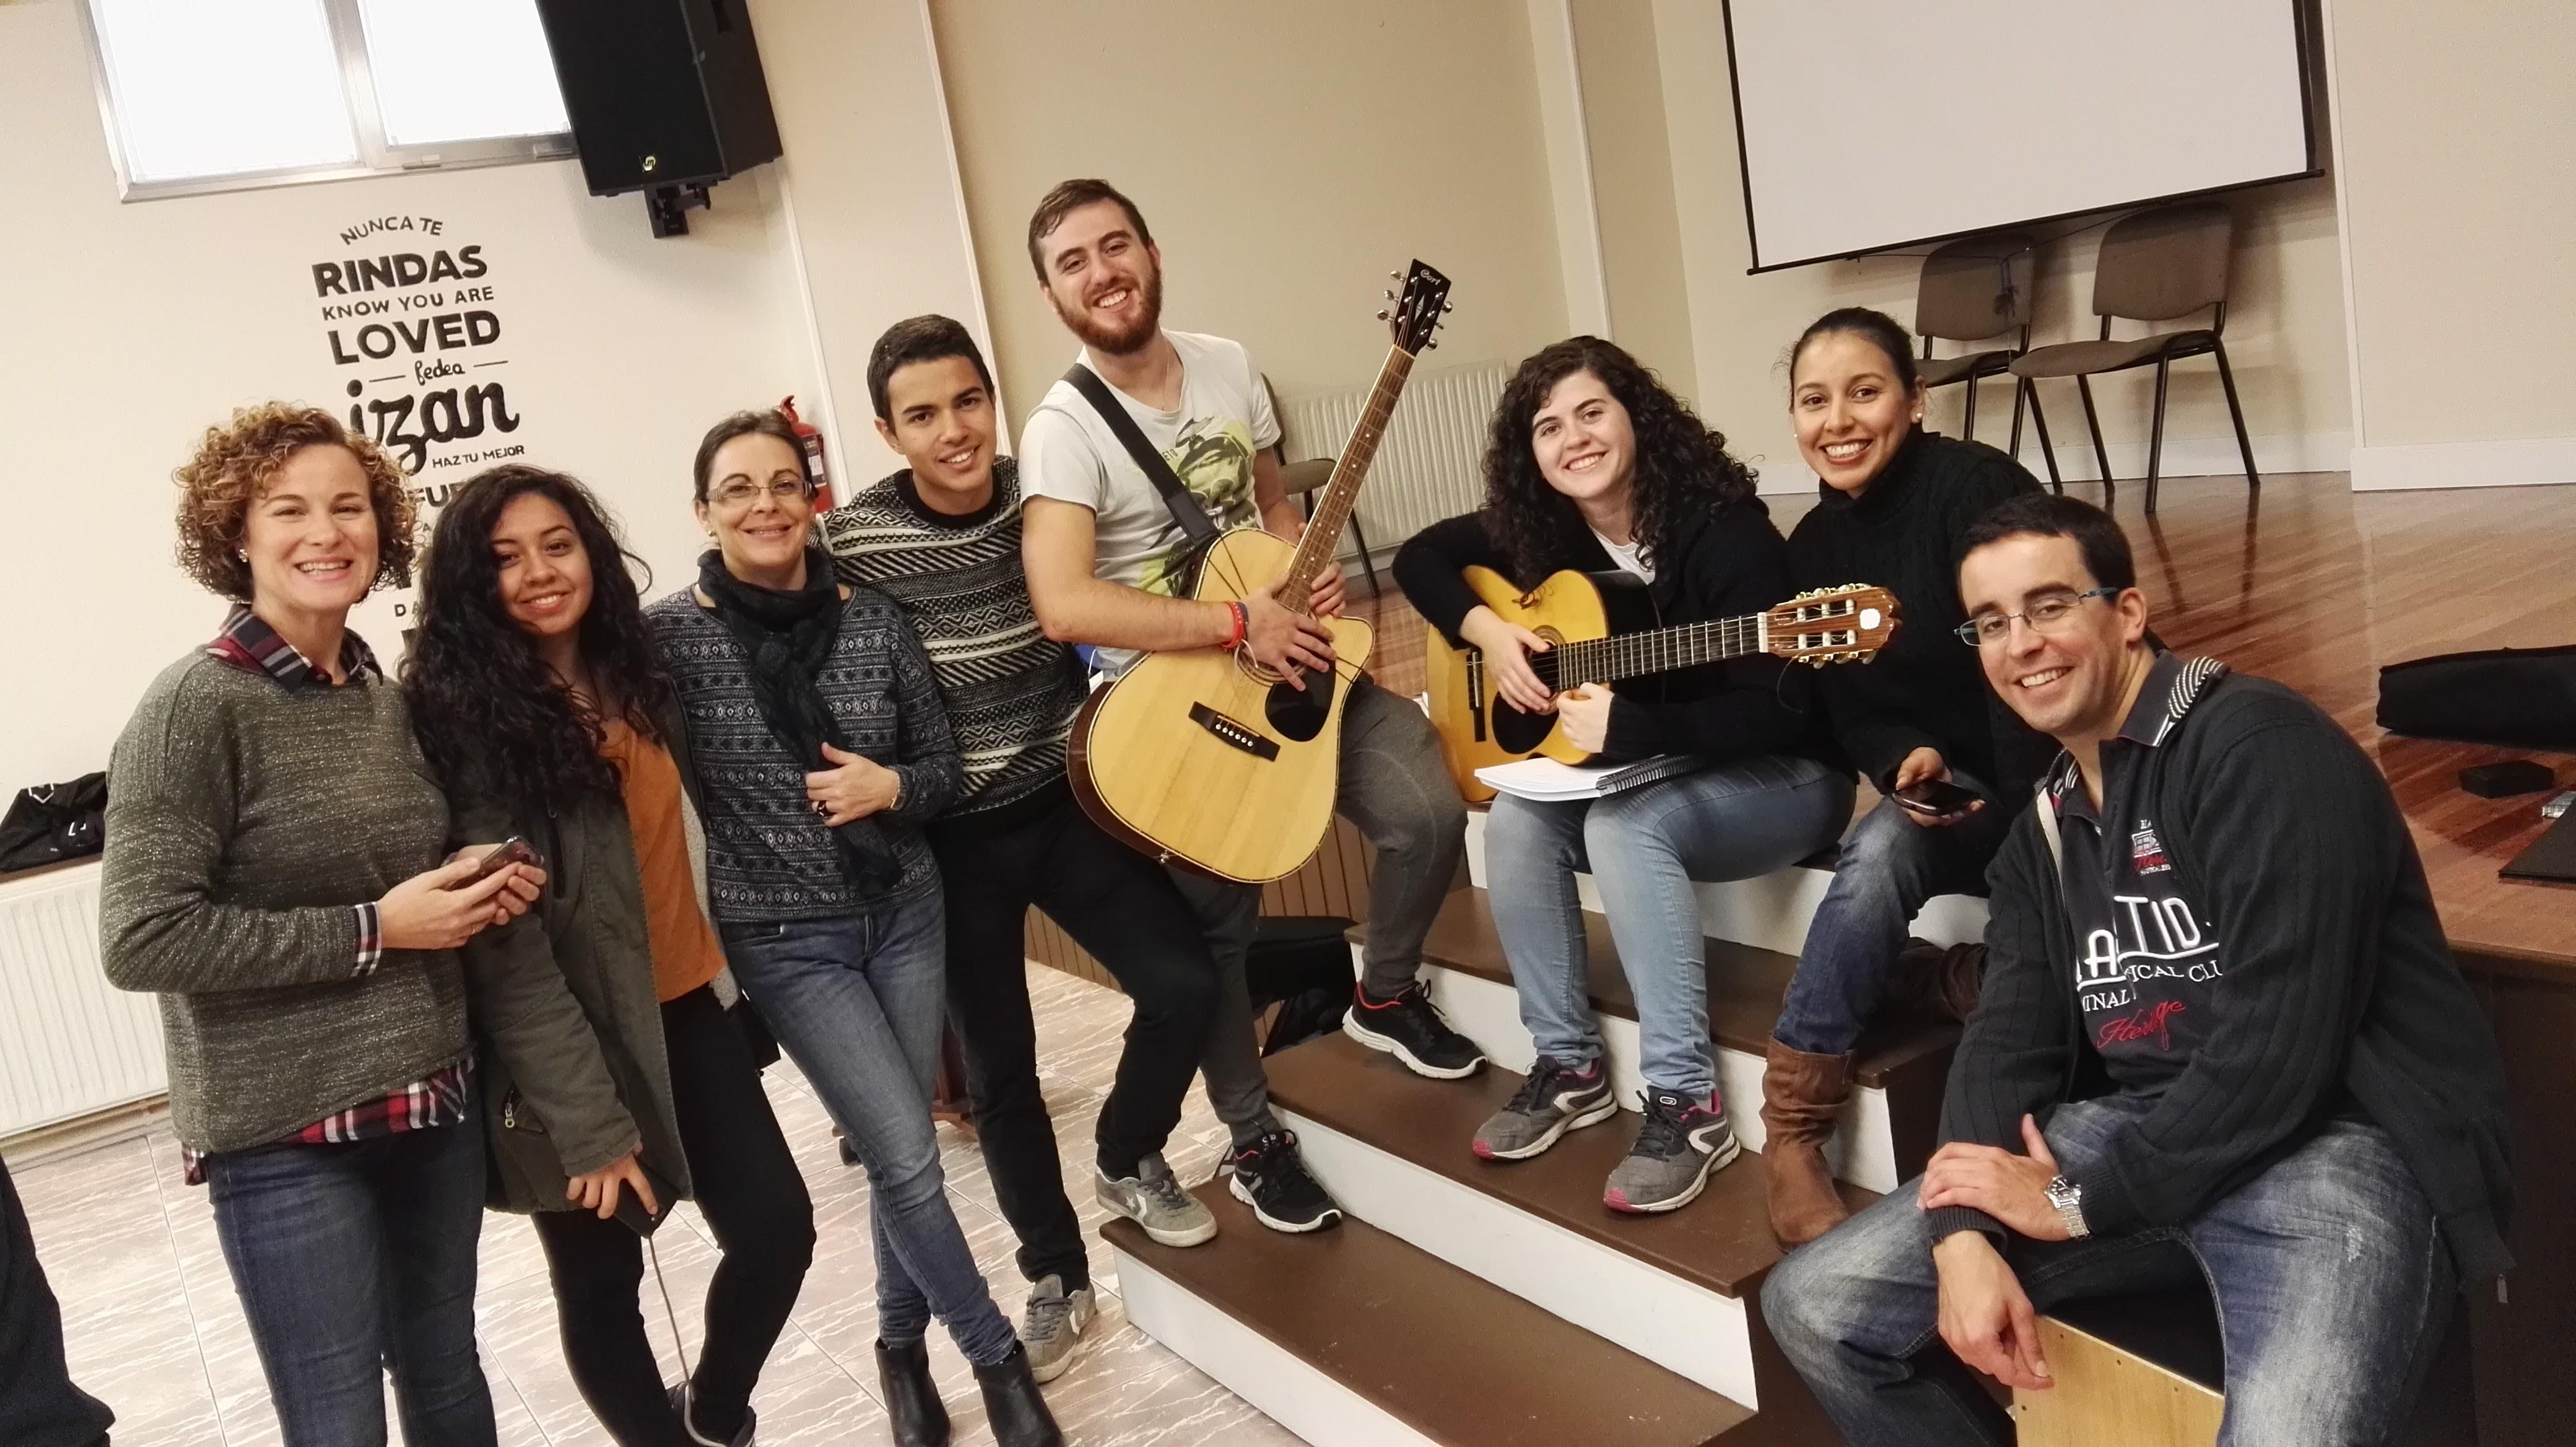 2016.10.22 y 23 - Retiro Ministerio de Música (9).jpg